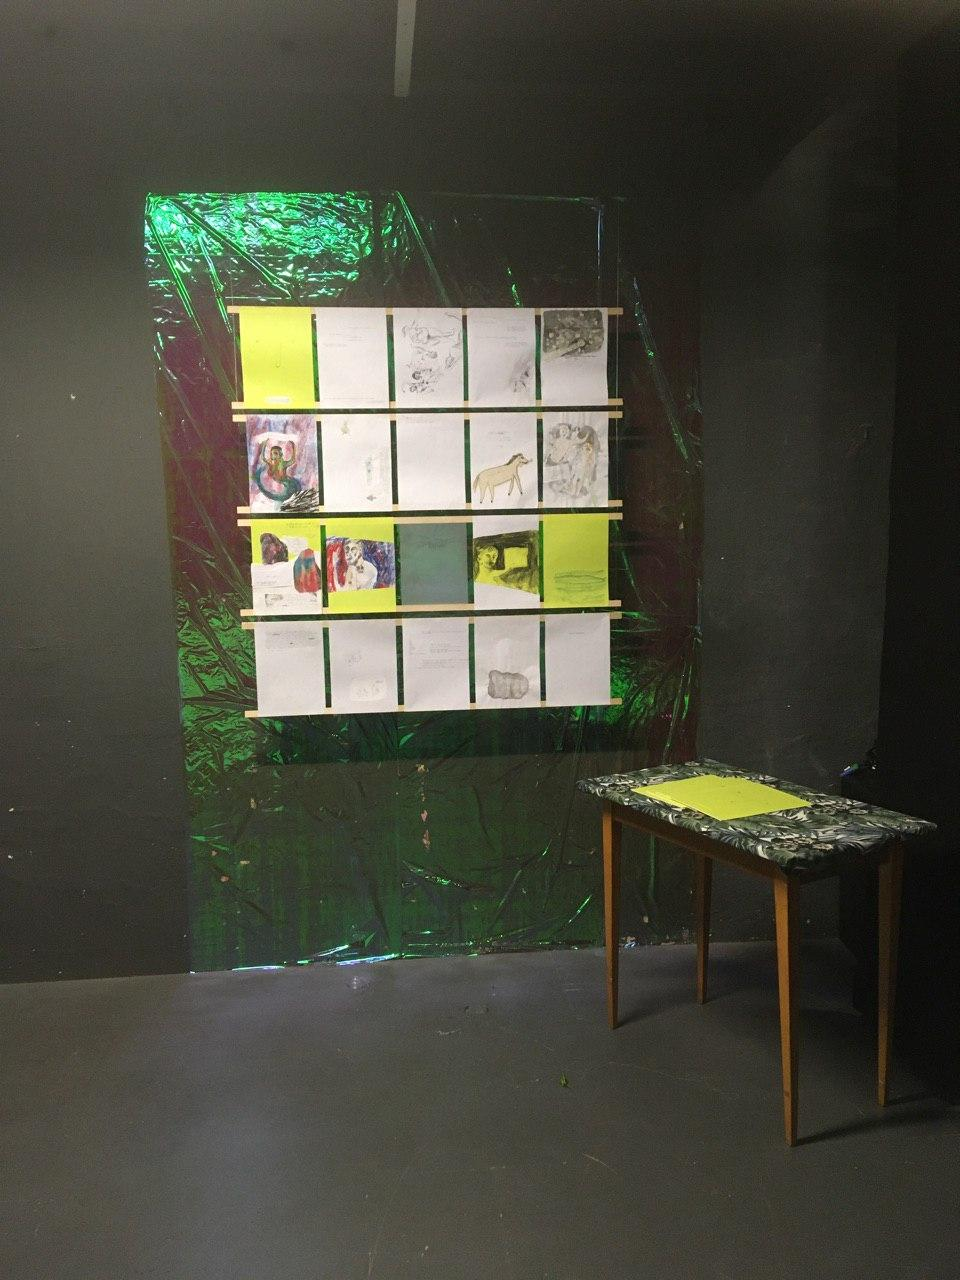 Ausstellungsansicht, Lila Festival 2019, Rote Fabrik, Zürich, 2019.